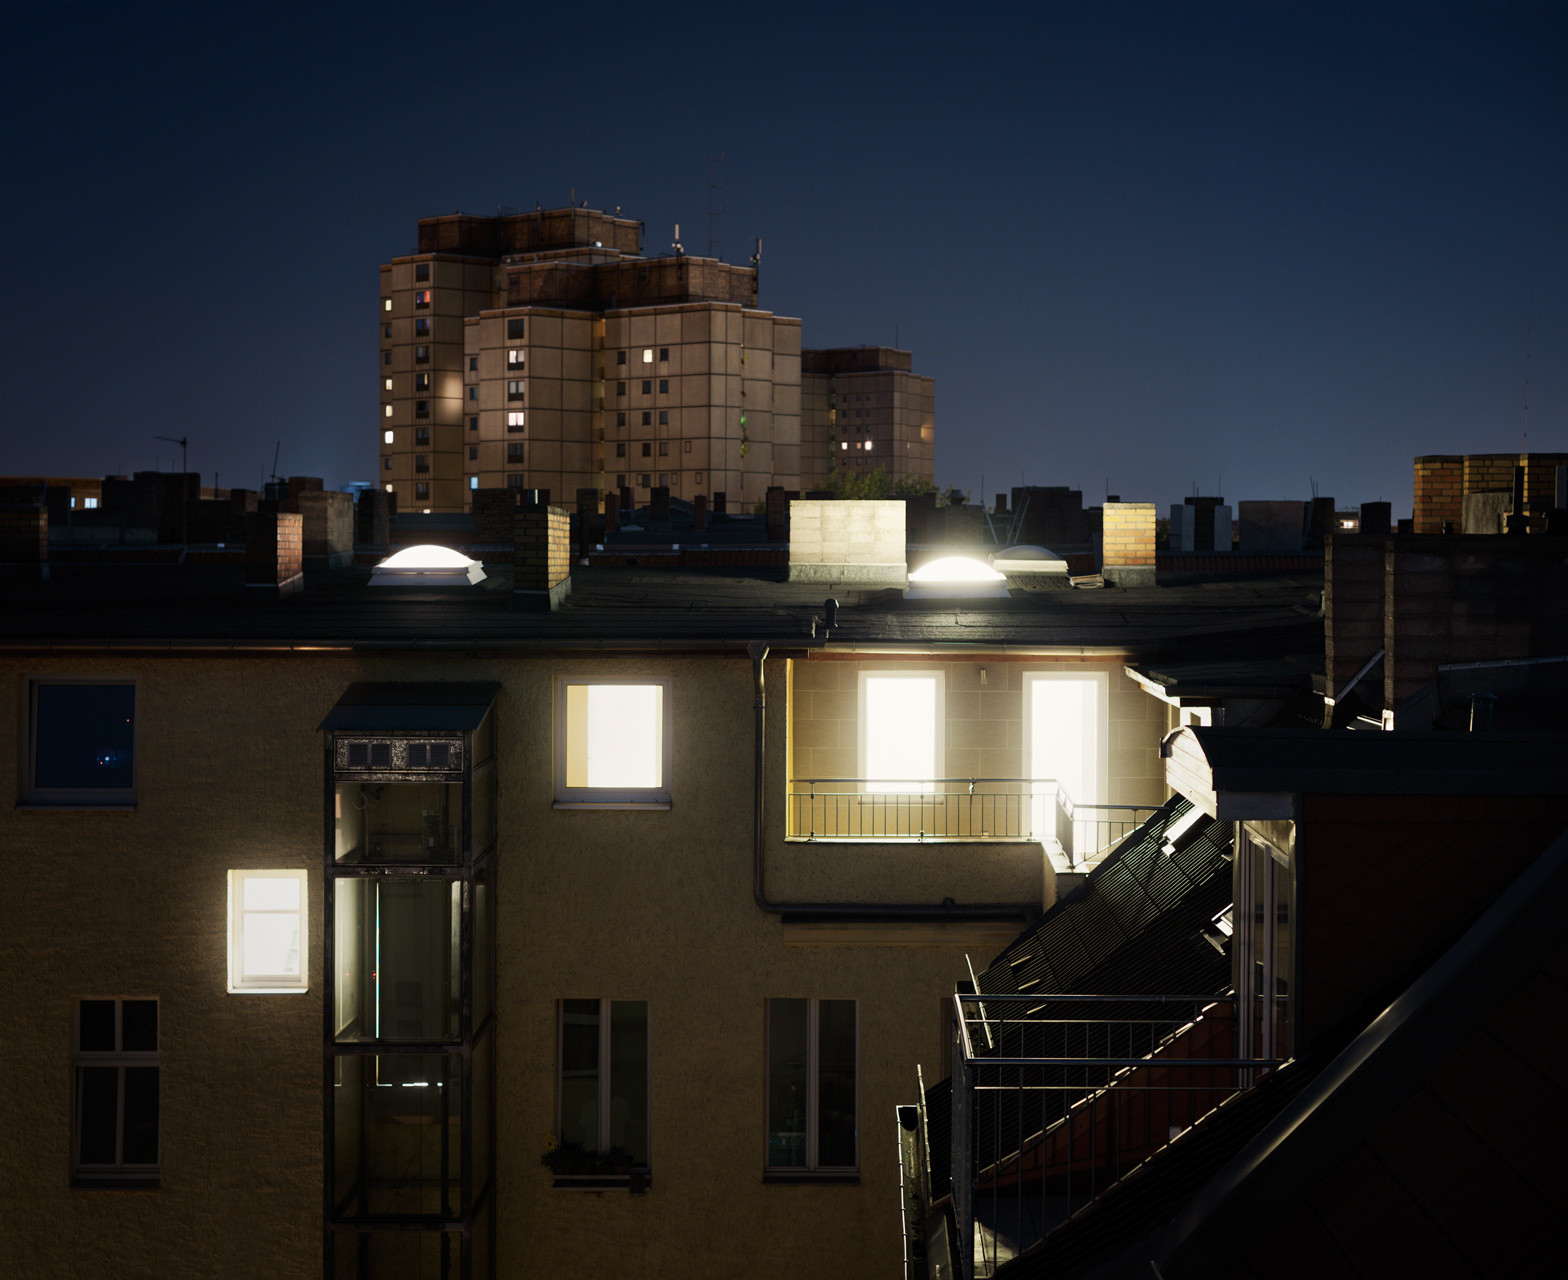 Timo_Stammberger_Architecture_Night_Prenzlauer_Berg_Illuminated_Citylights